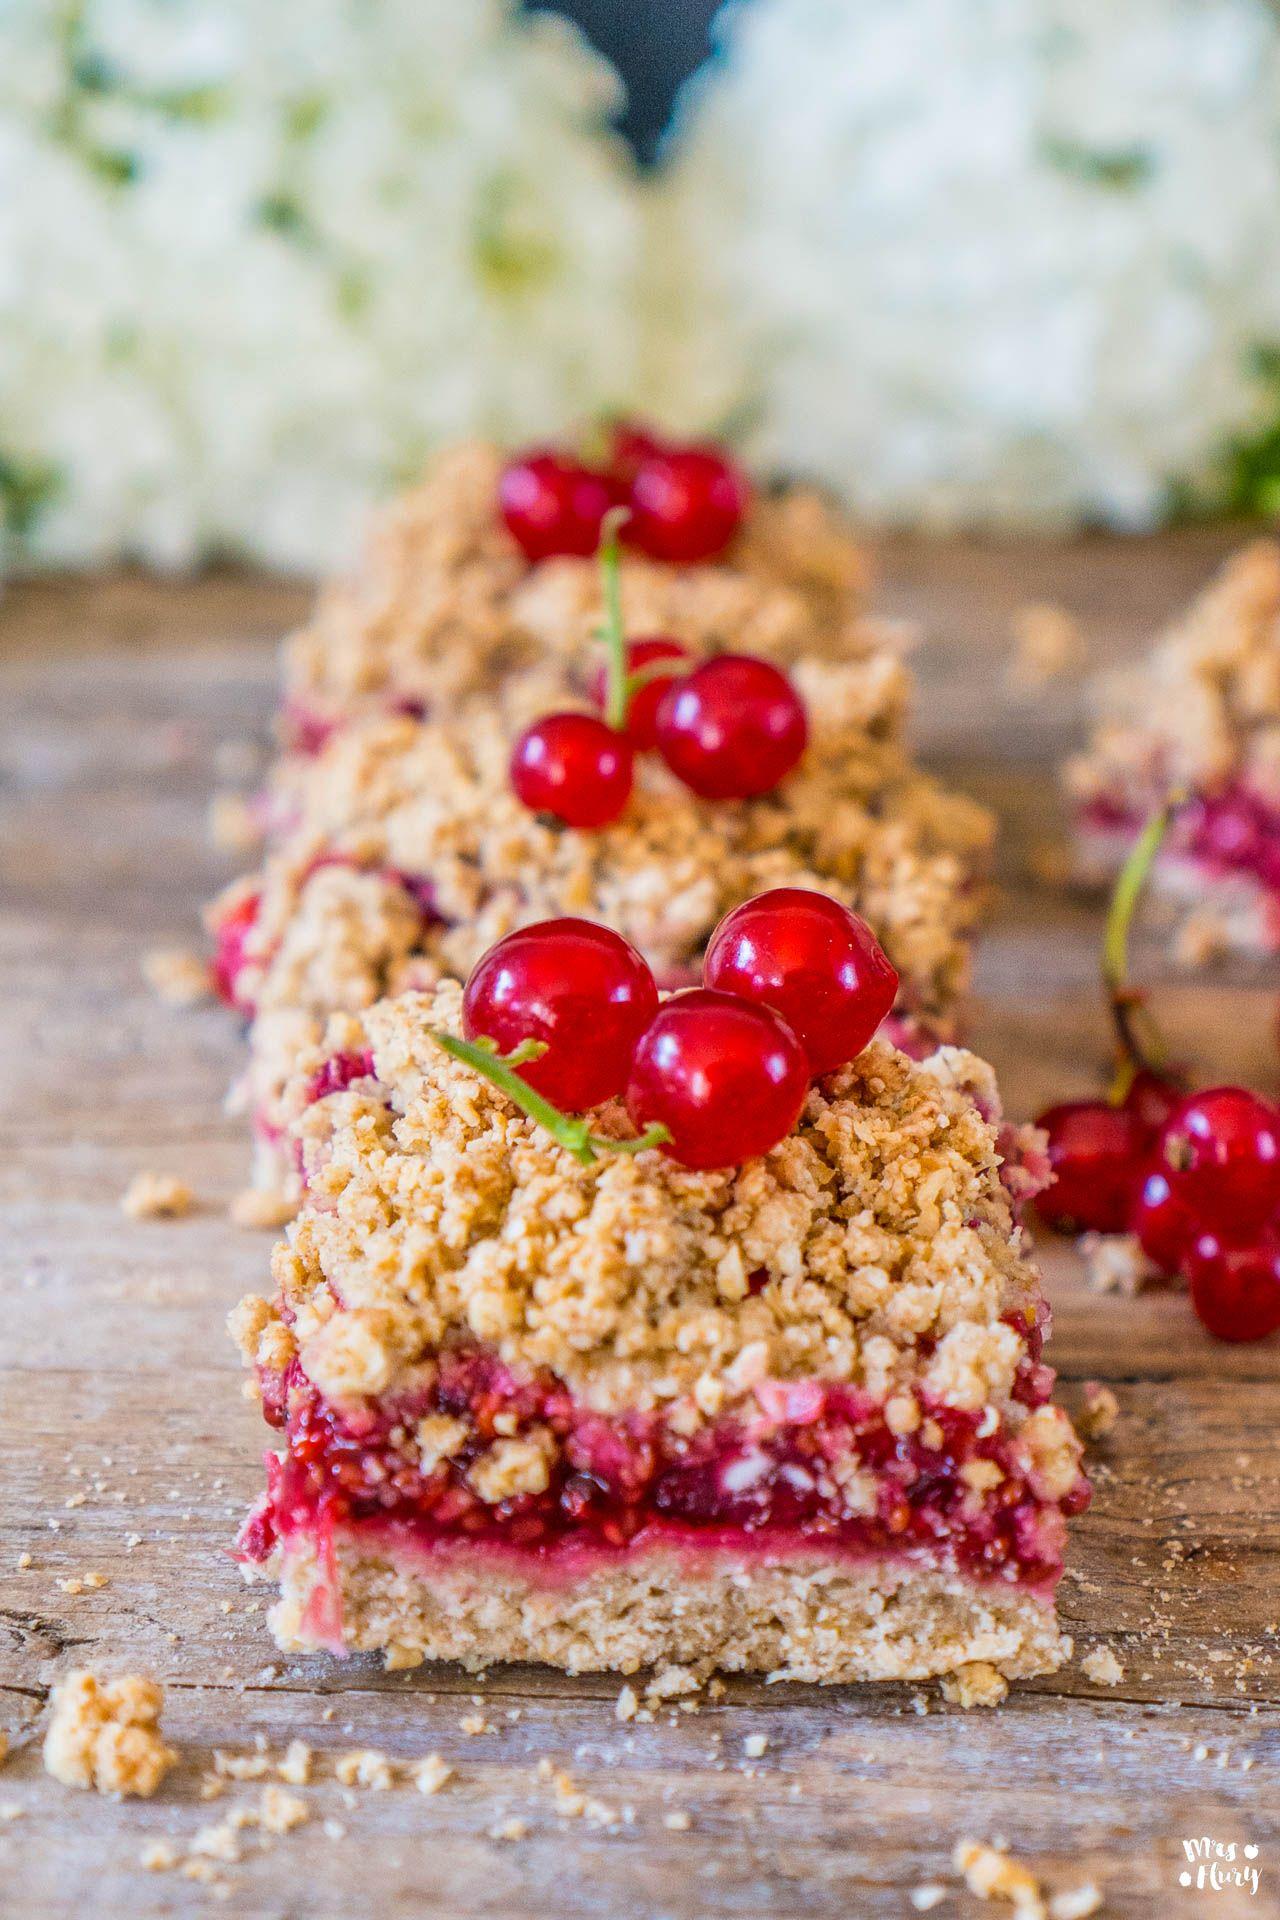 Gesunde Johannisbeeren Streusel Schnitten Vegan Rezept Susse Backerei Lebensmittel Essen Und Dessert Rezepte